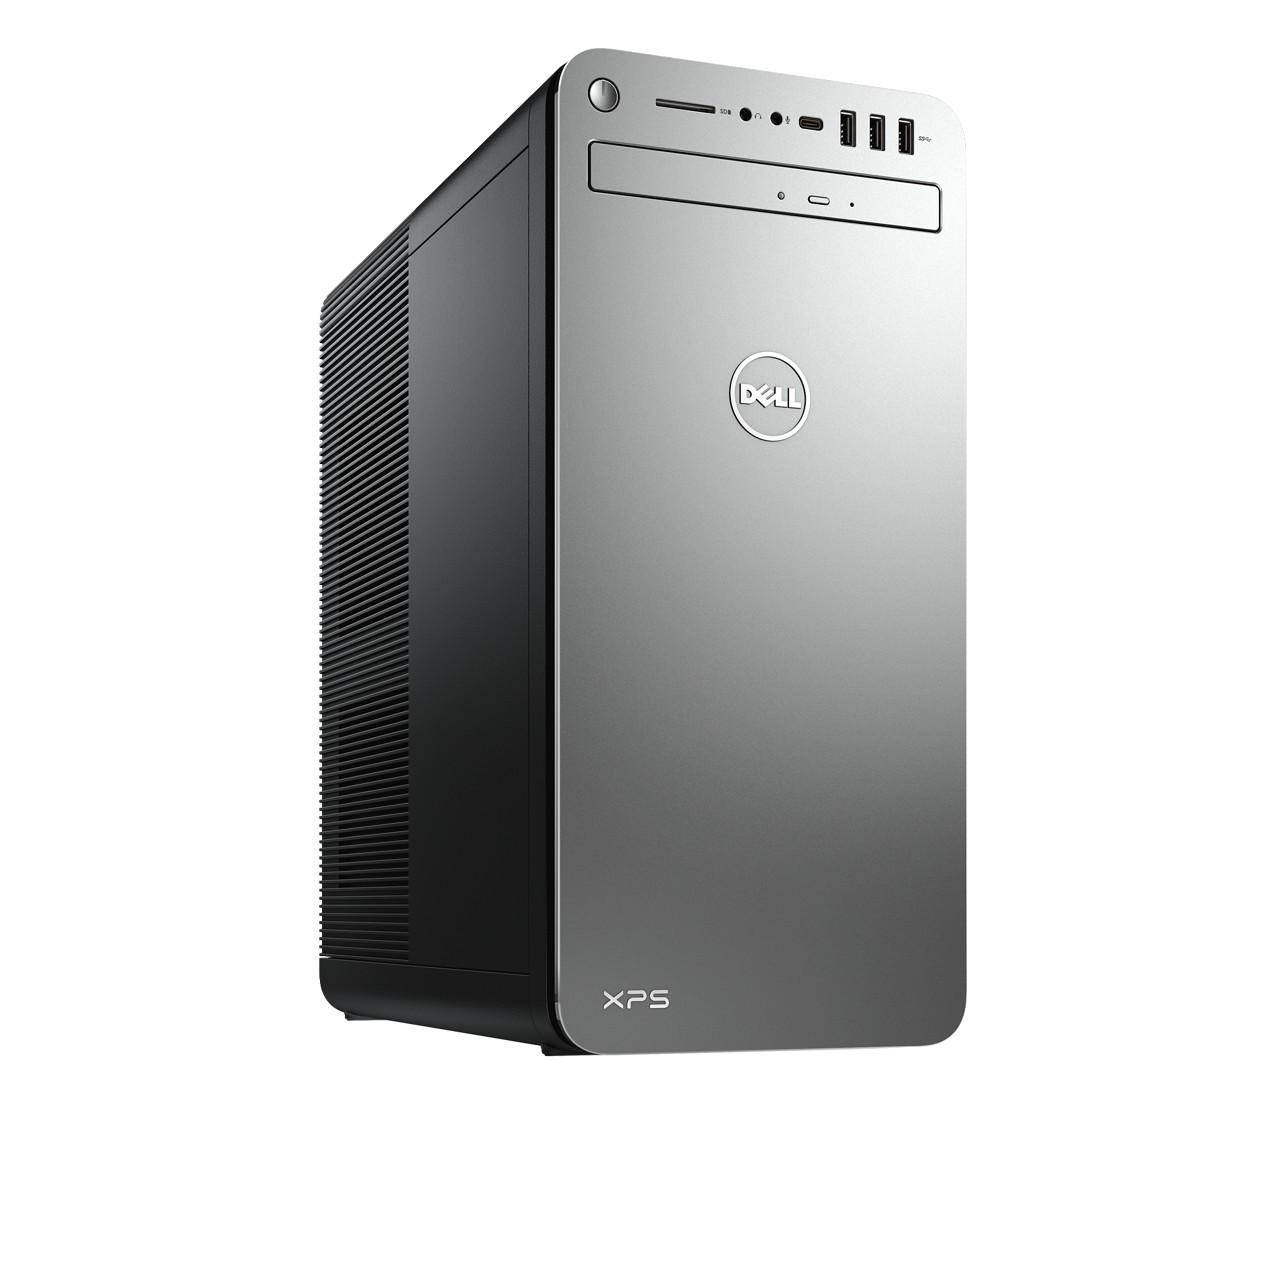 Dell XPS Tower Special Edition- 8930- GTX 1080- i7 8086K - 2TB SSD + 2TB  HDD- 64GB RAM